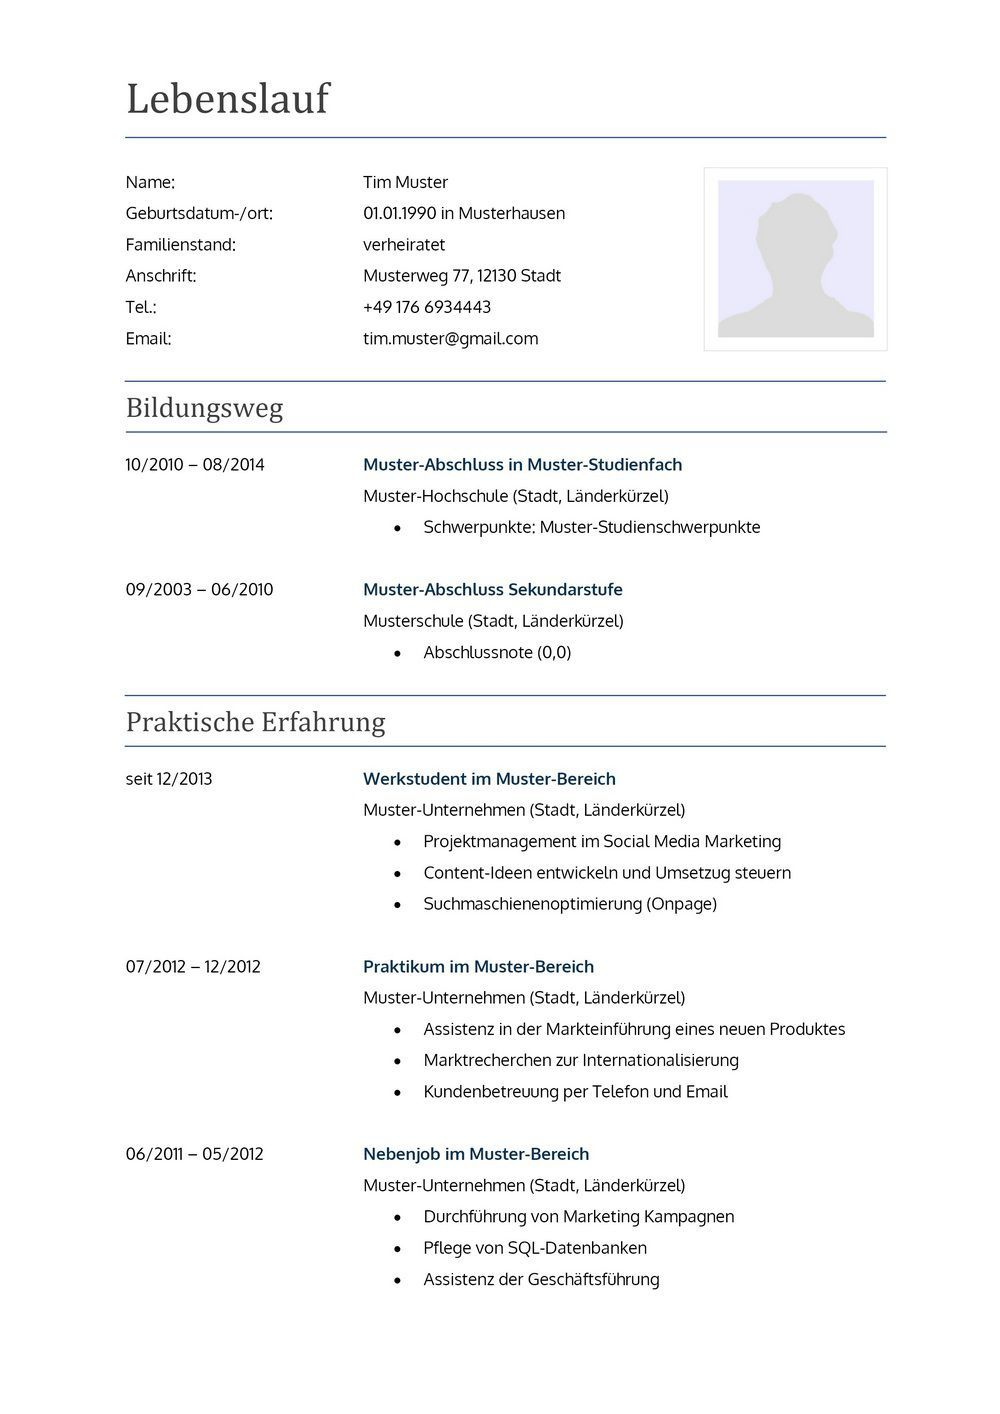 Lebenslauf Muster 4 Free Resume Template Word Resume Template Word